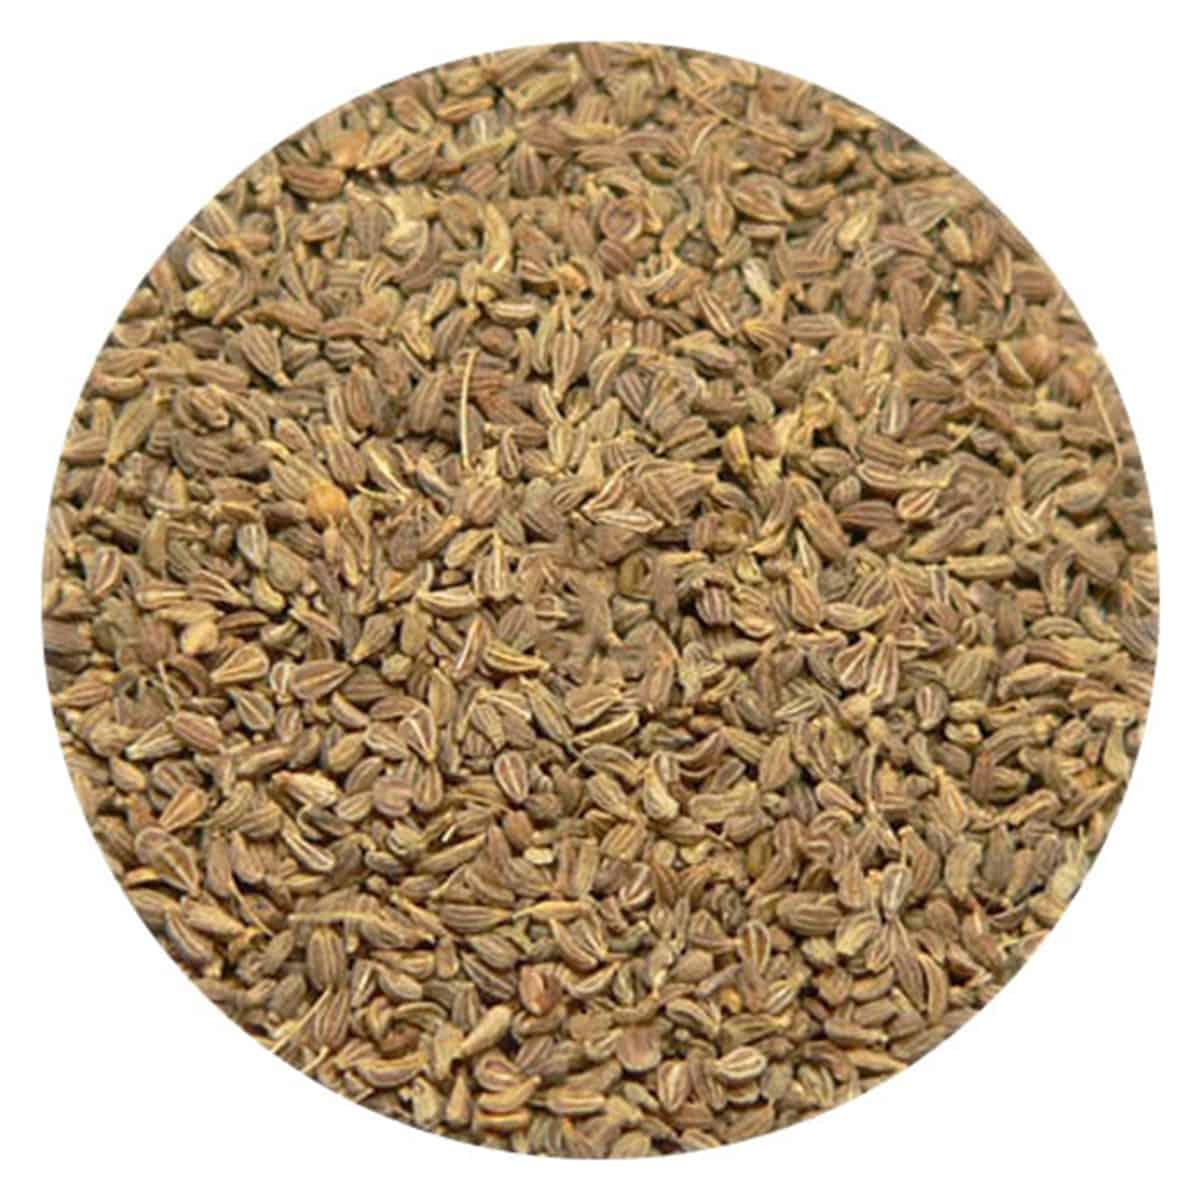 Buy IAG Foods Aniseed Seeds - 1 kg